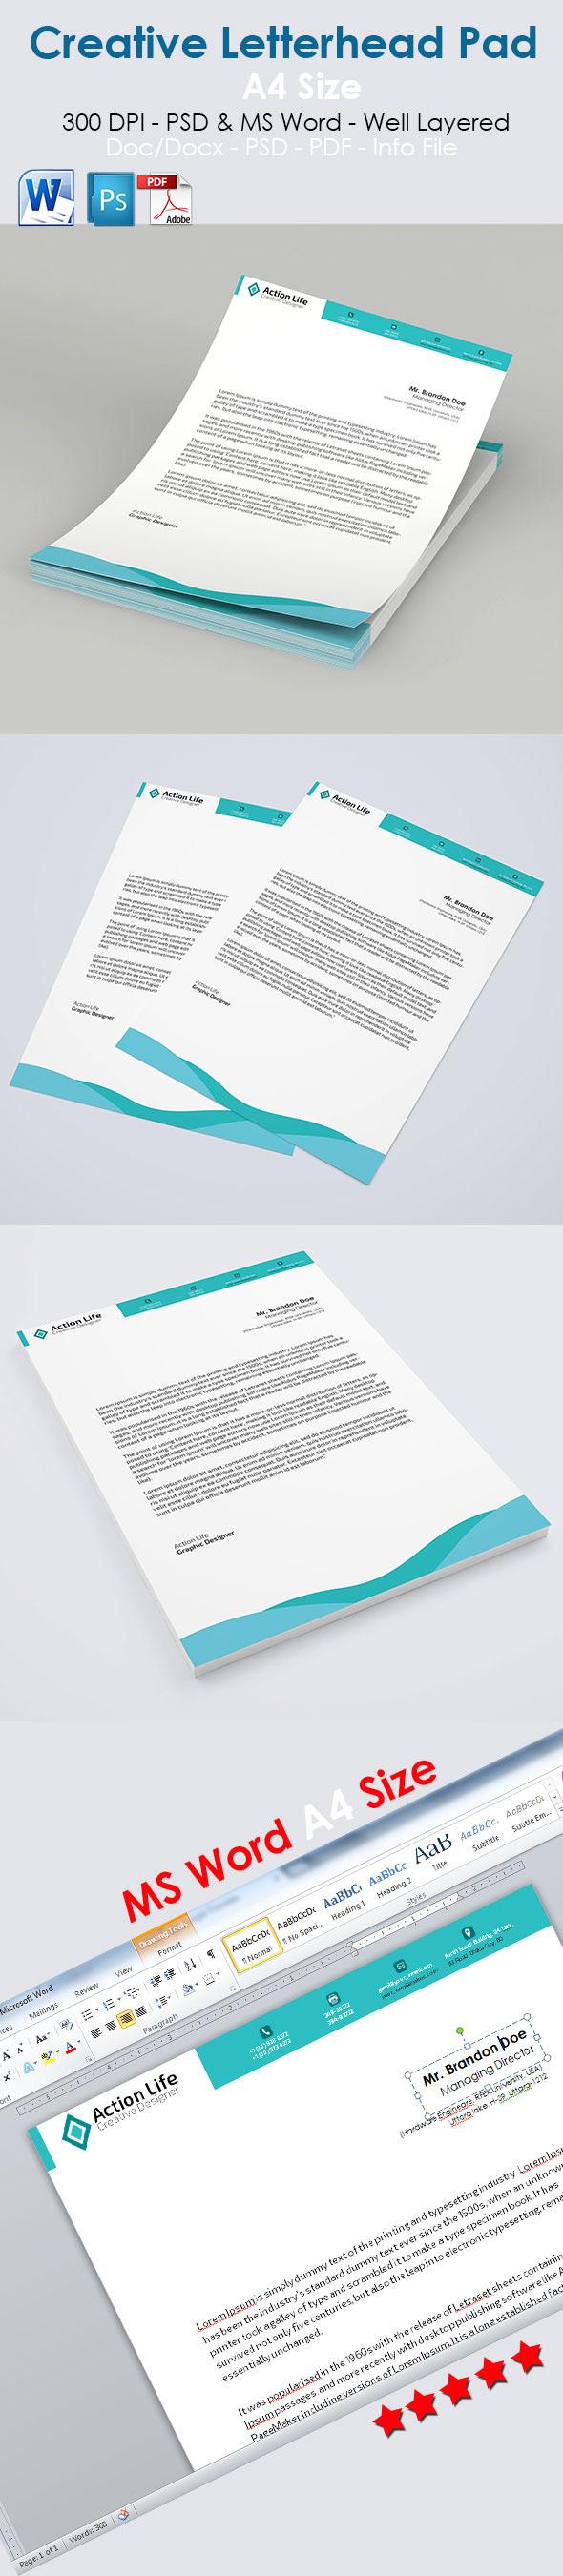 Free Creative A4 Letterhead Template PSD